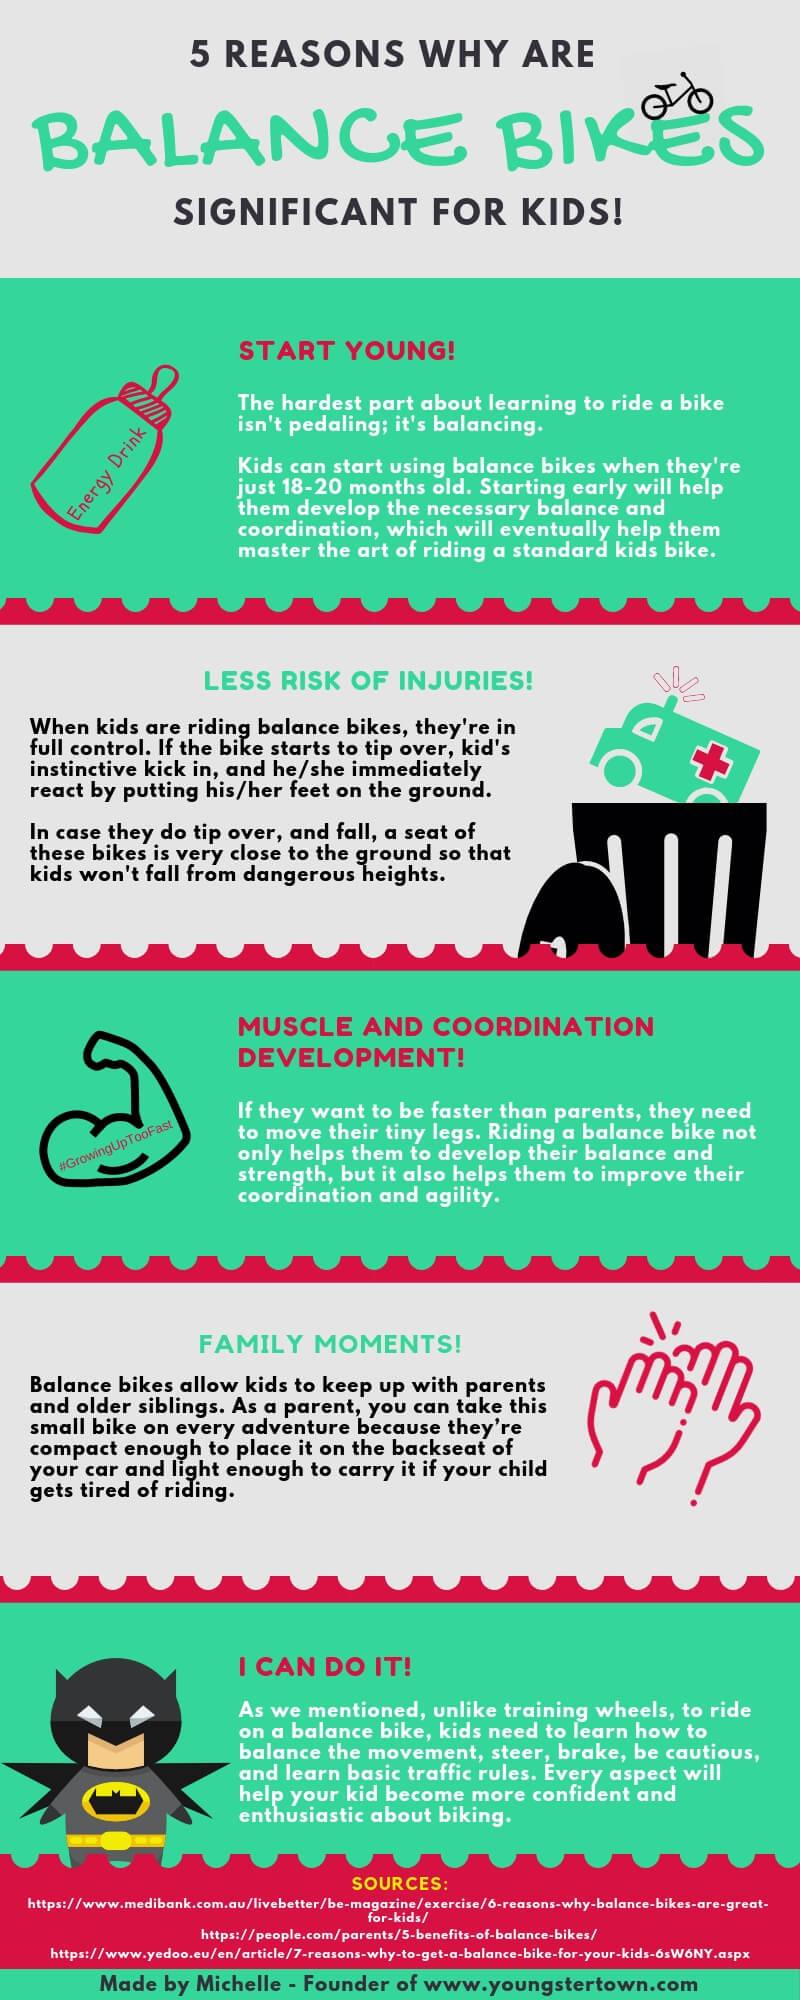 5 Most Crucial Balance Bike Benefits